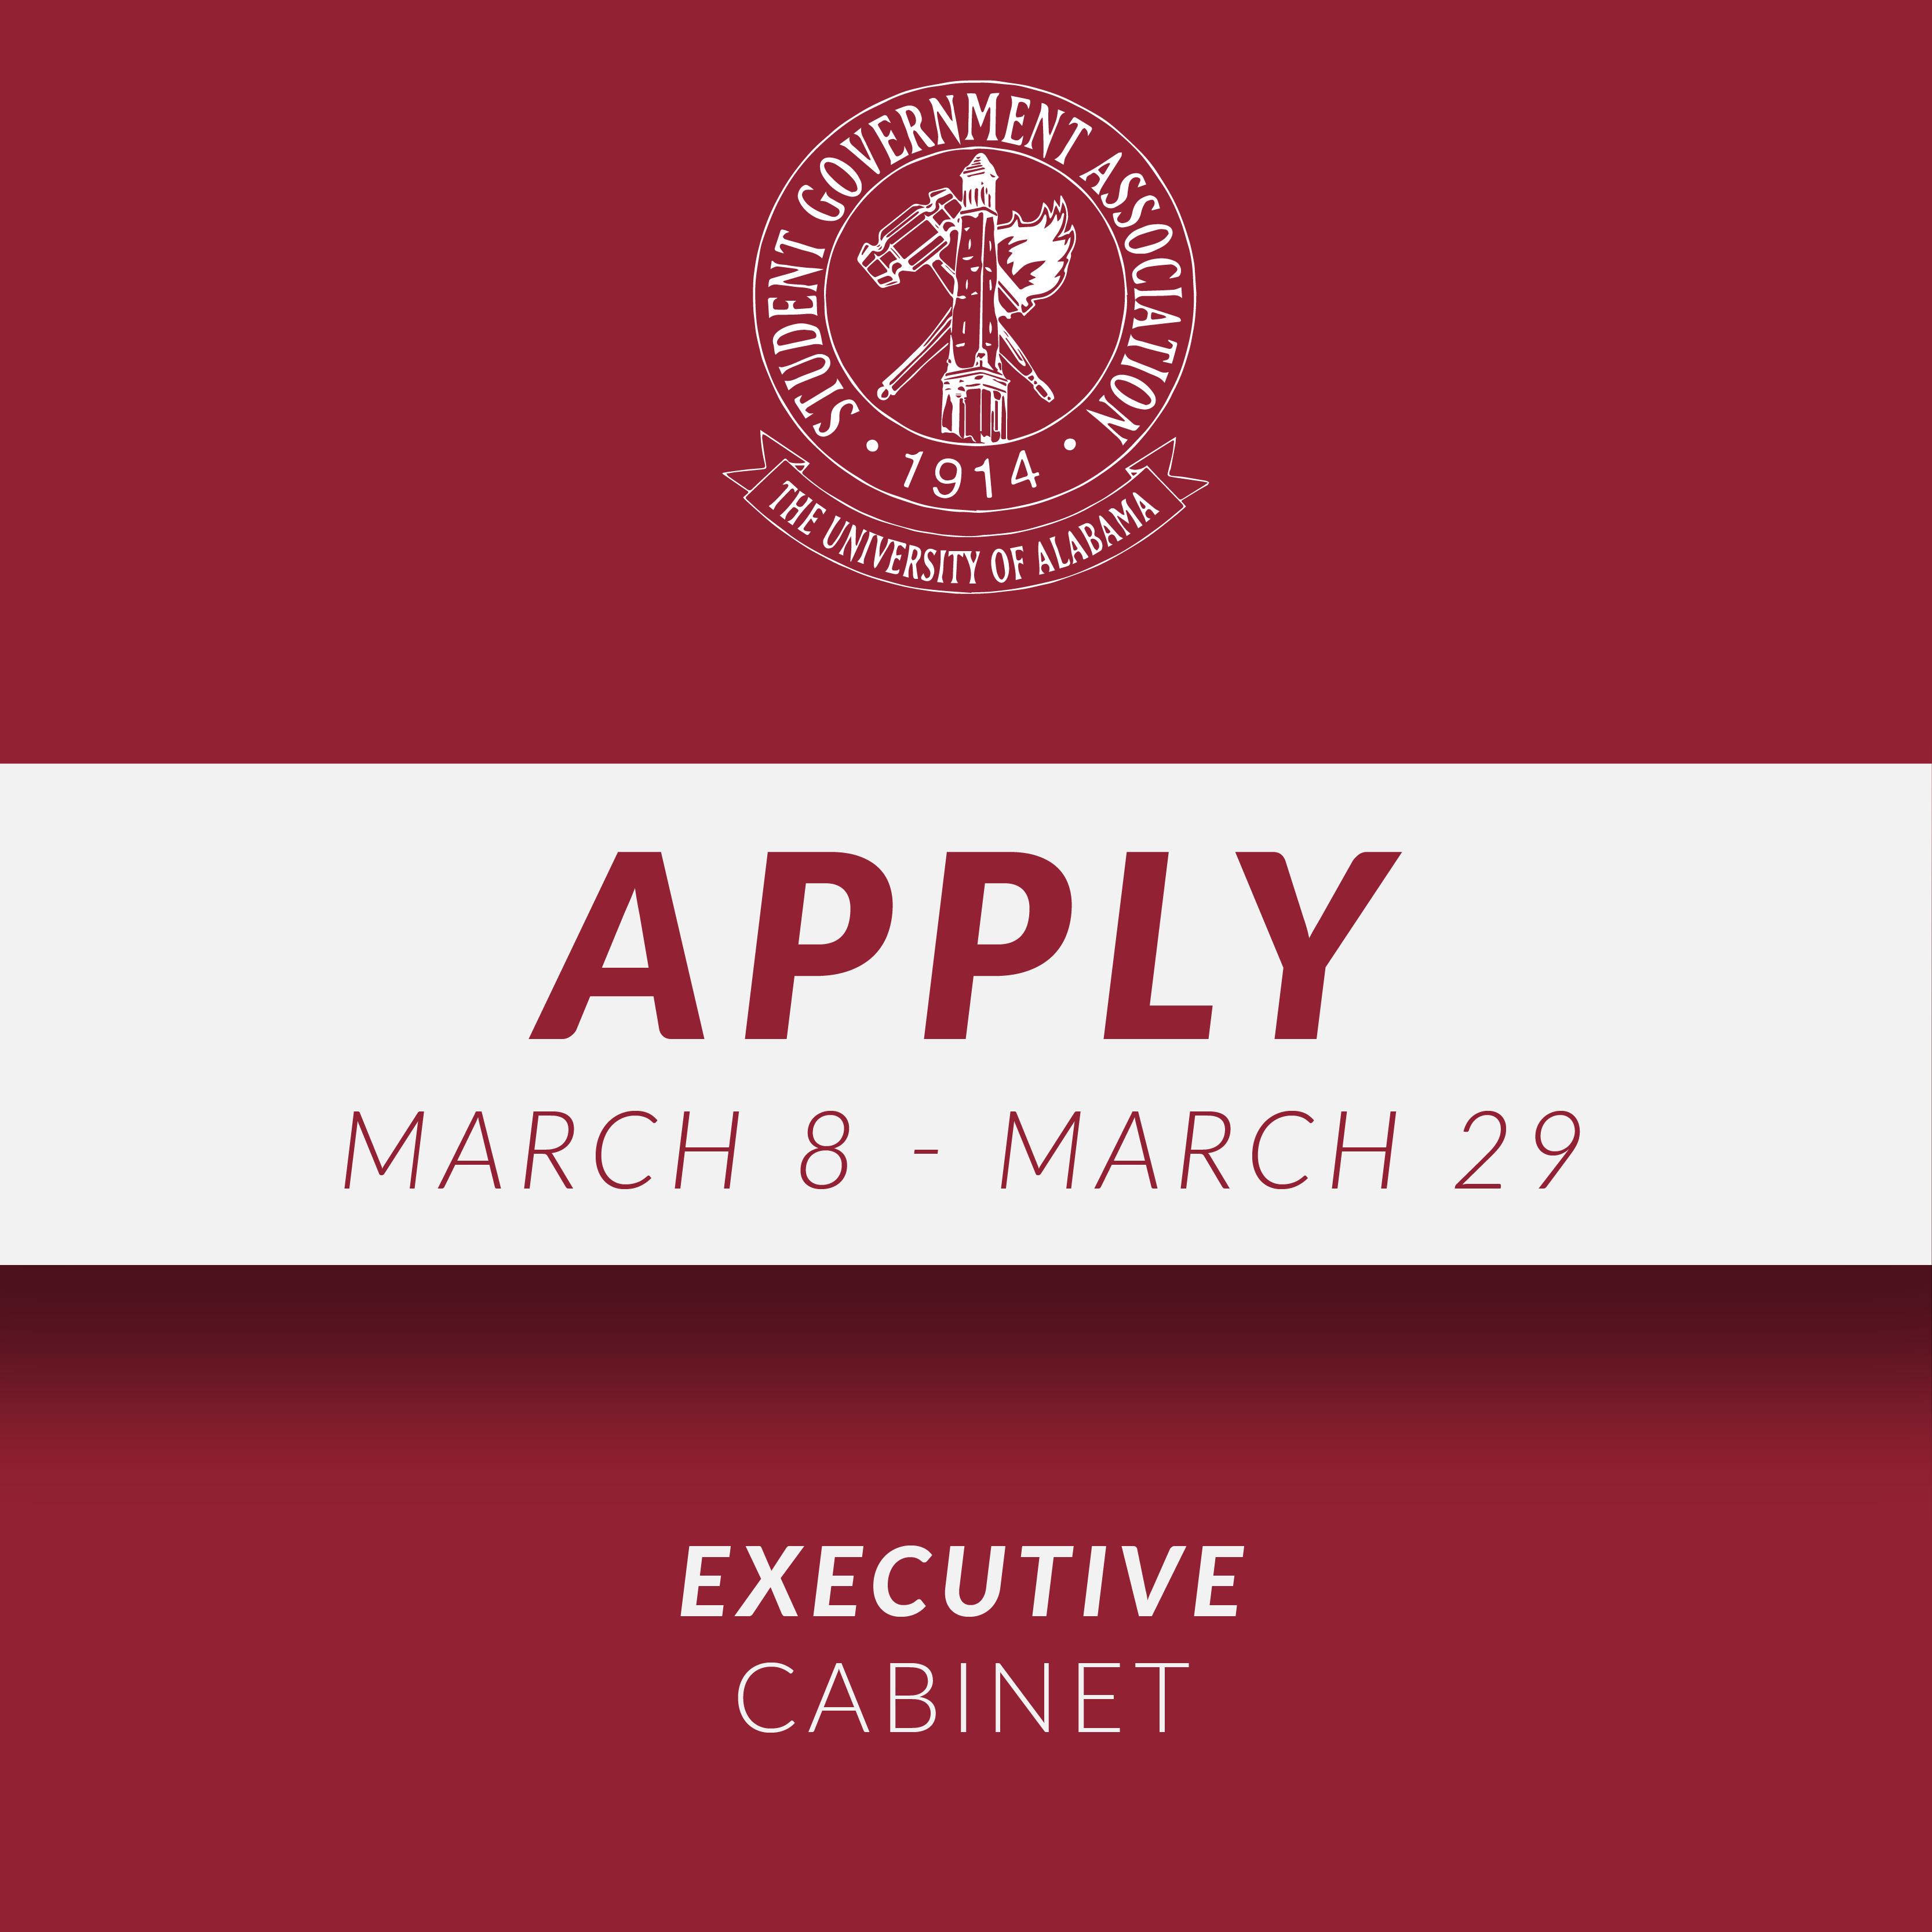 Executive Cabinet Application